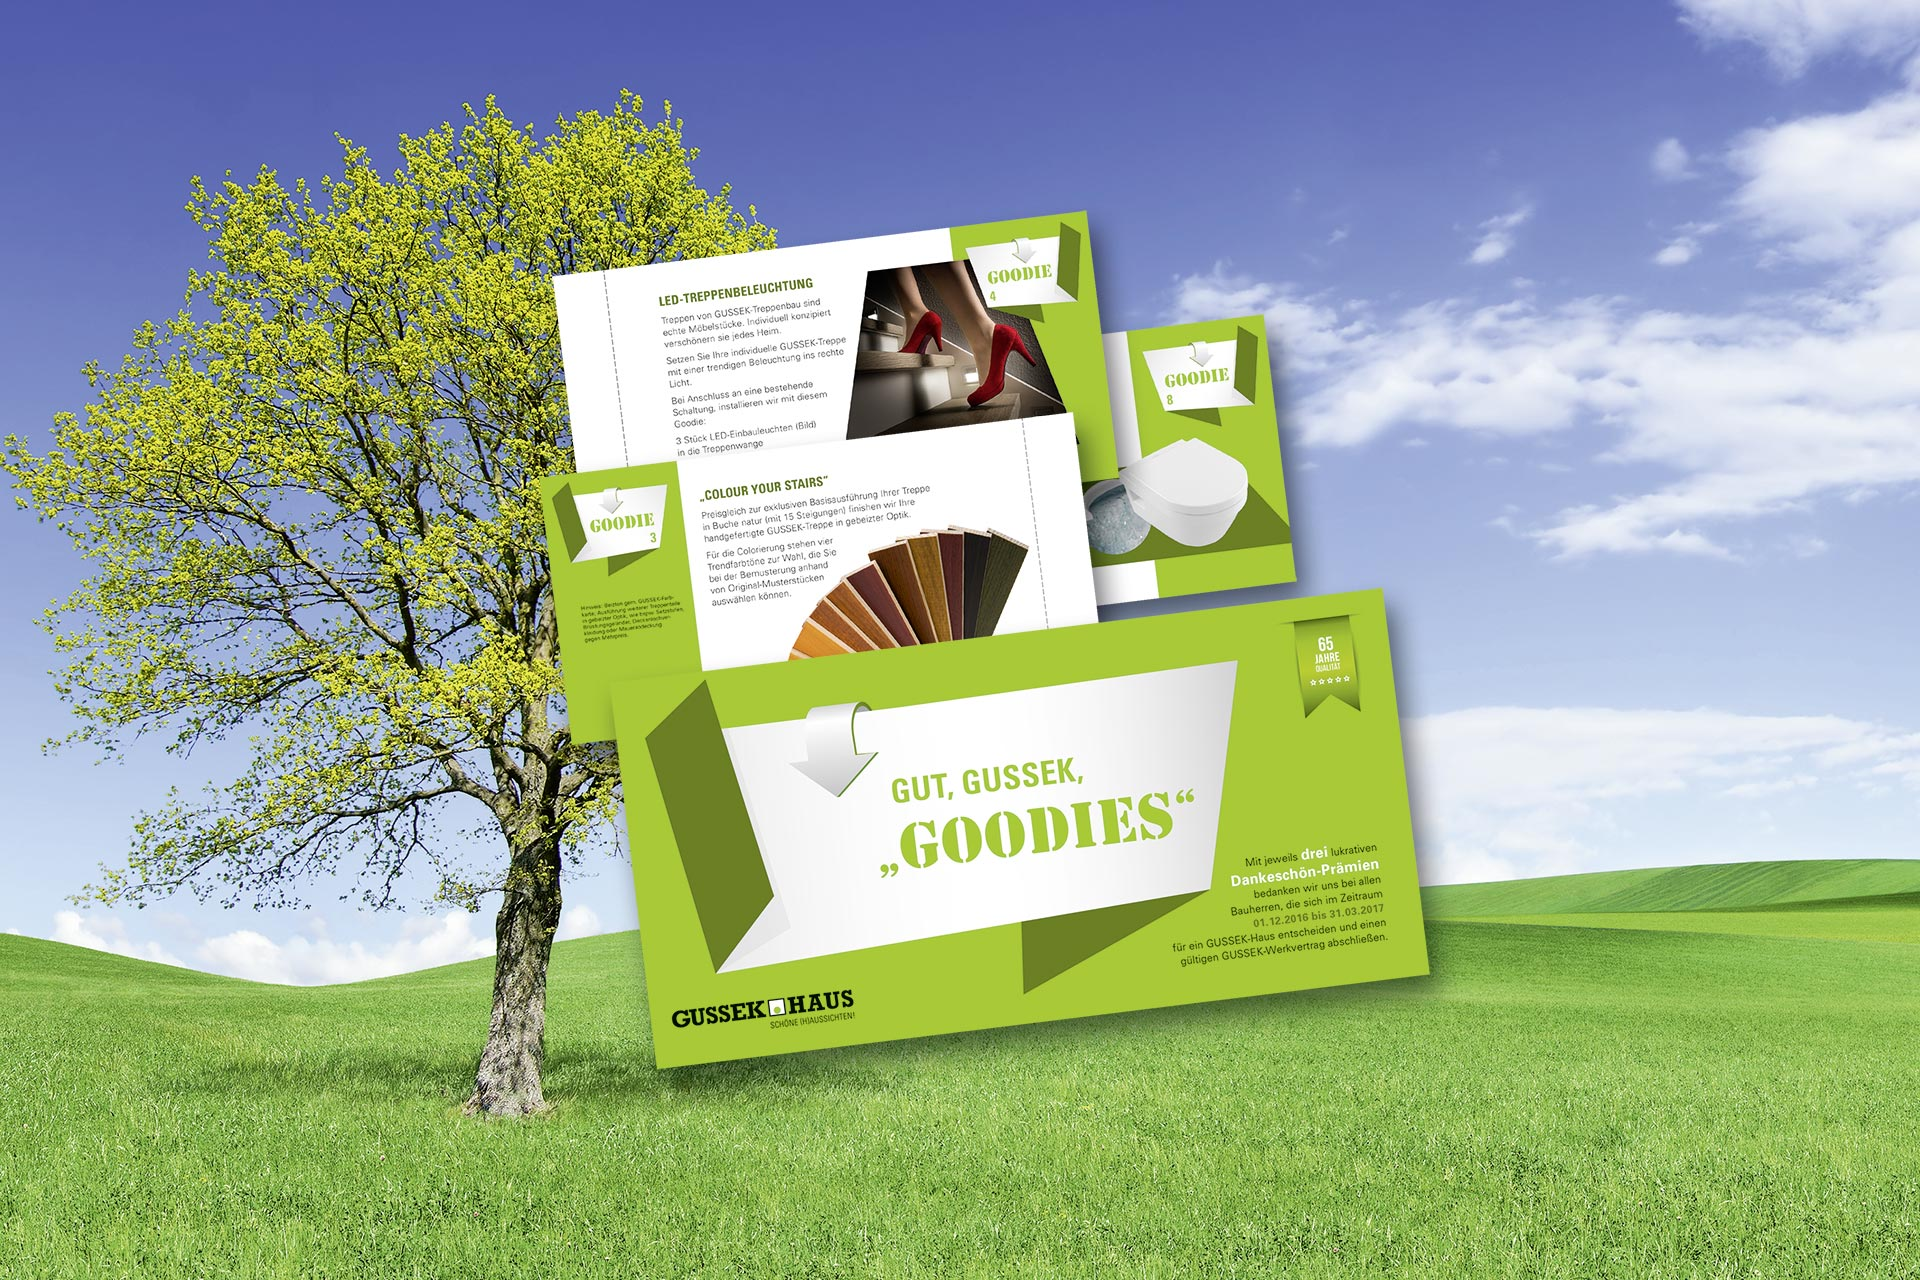 GUSSEK HAUS - Goodies